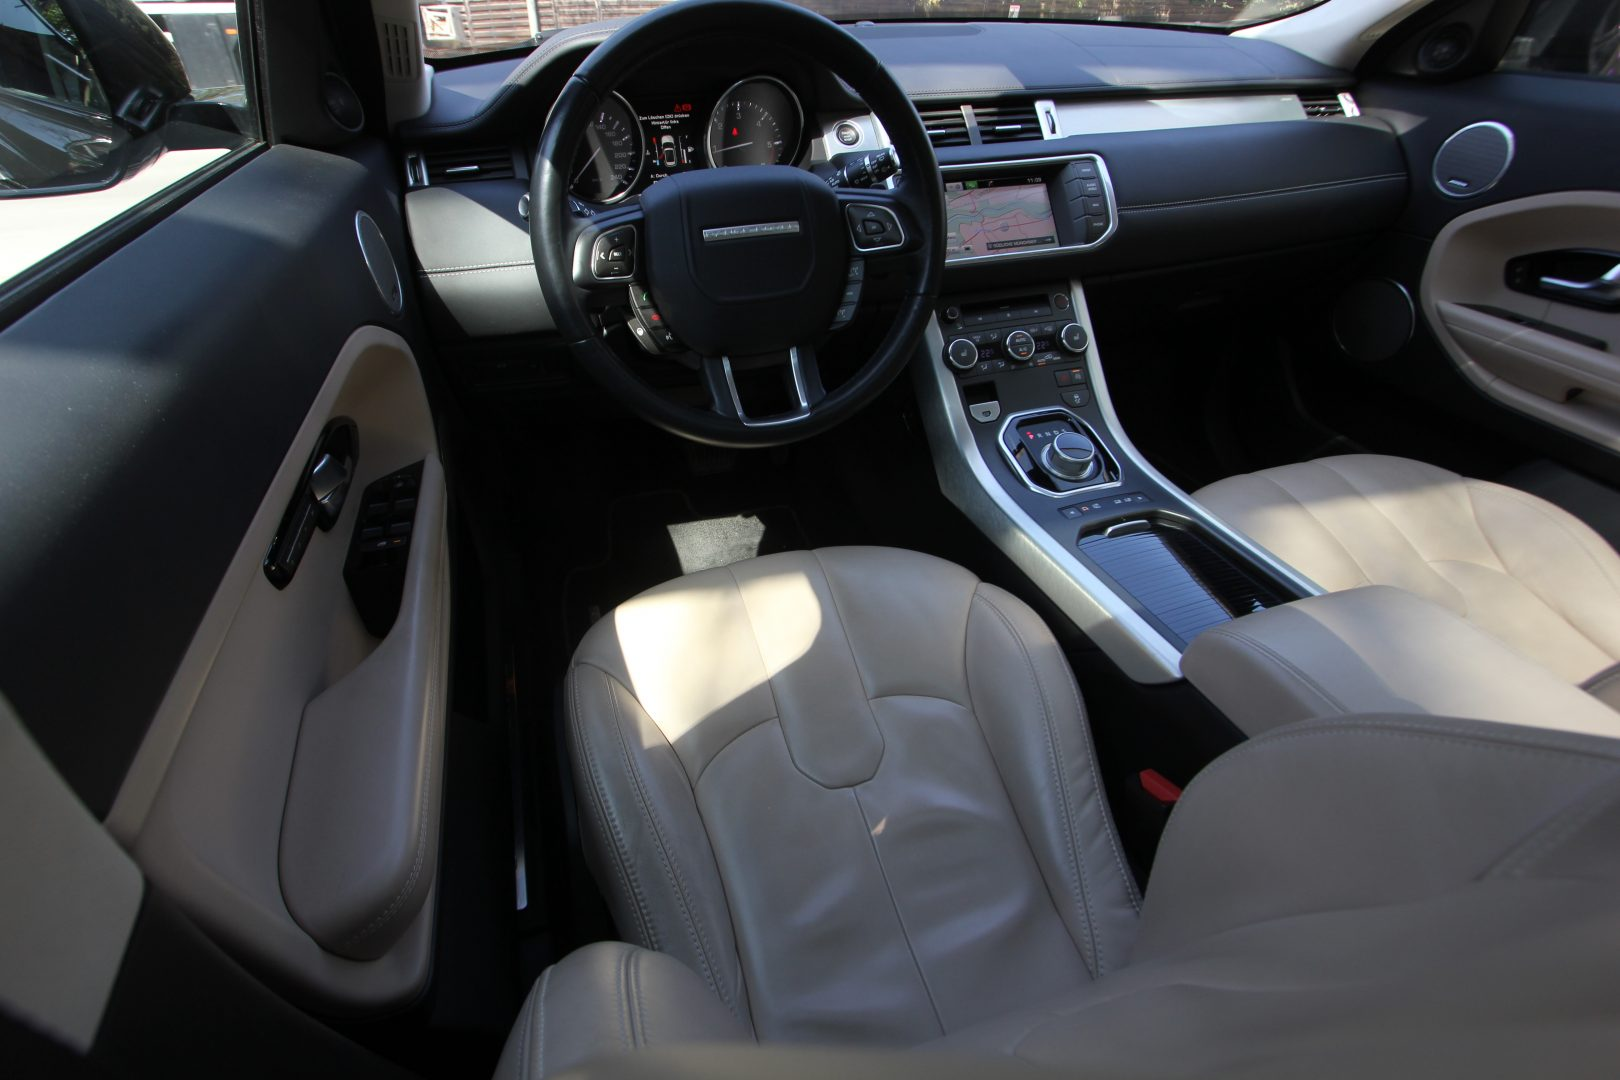 AIL Land Rover Range Rover Evoque Prestige 13